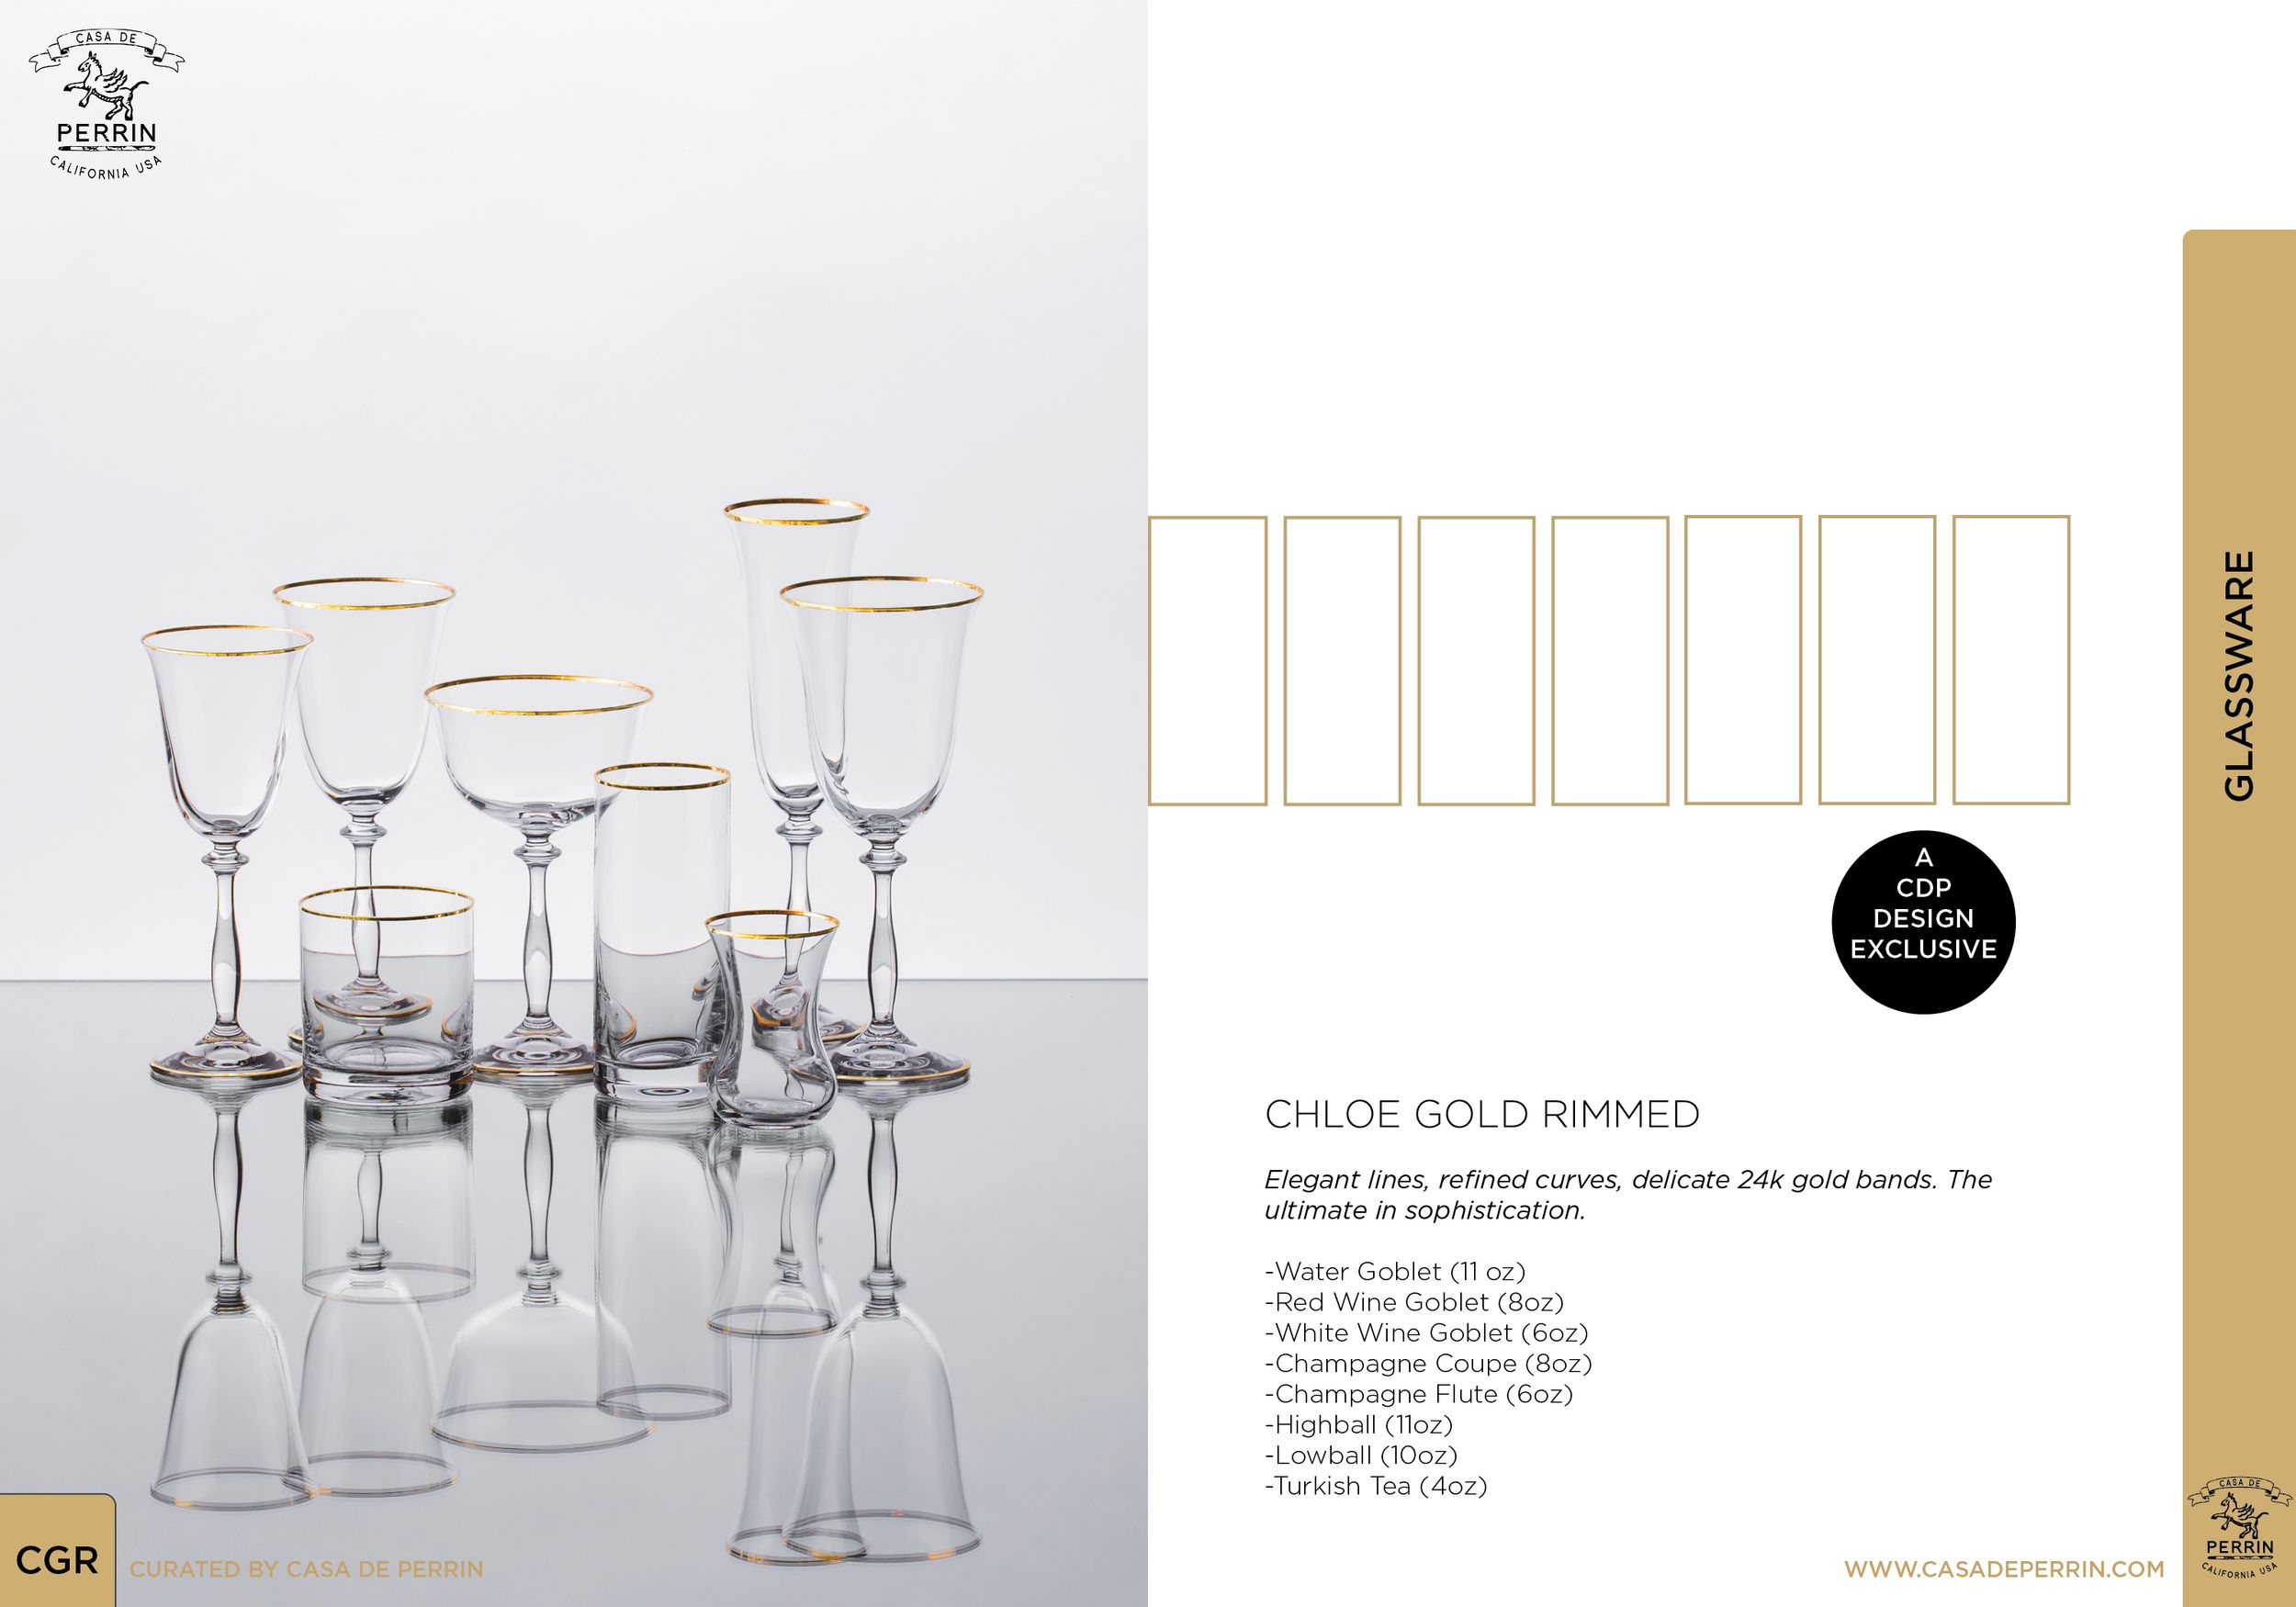 Chloe Gold Rimmed / Glassware